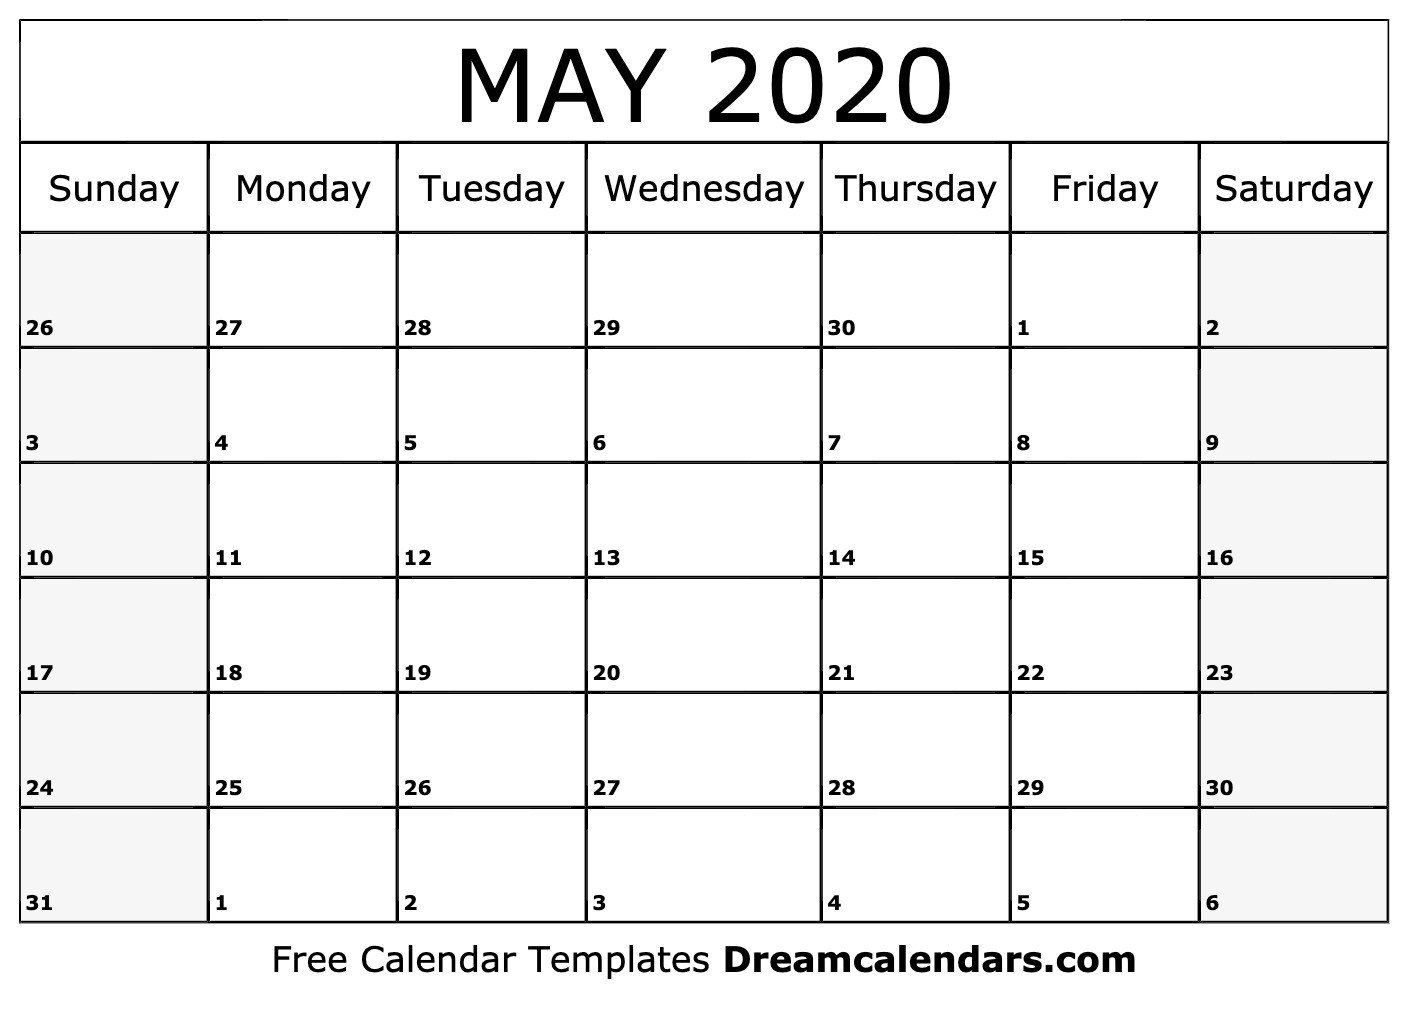 May Calendar 2020 Printable Printable May 2020 Calendar